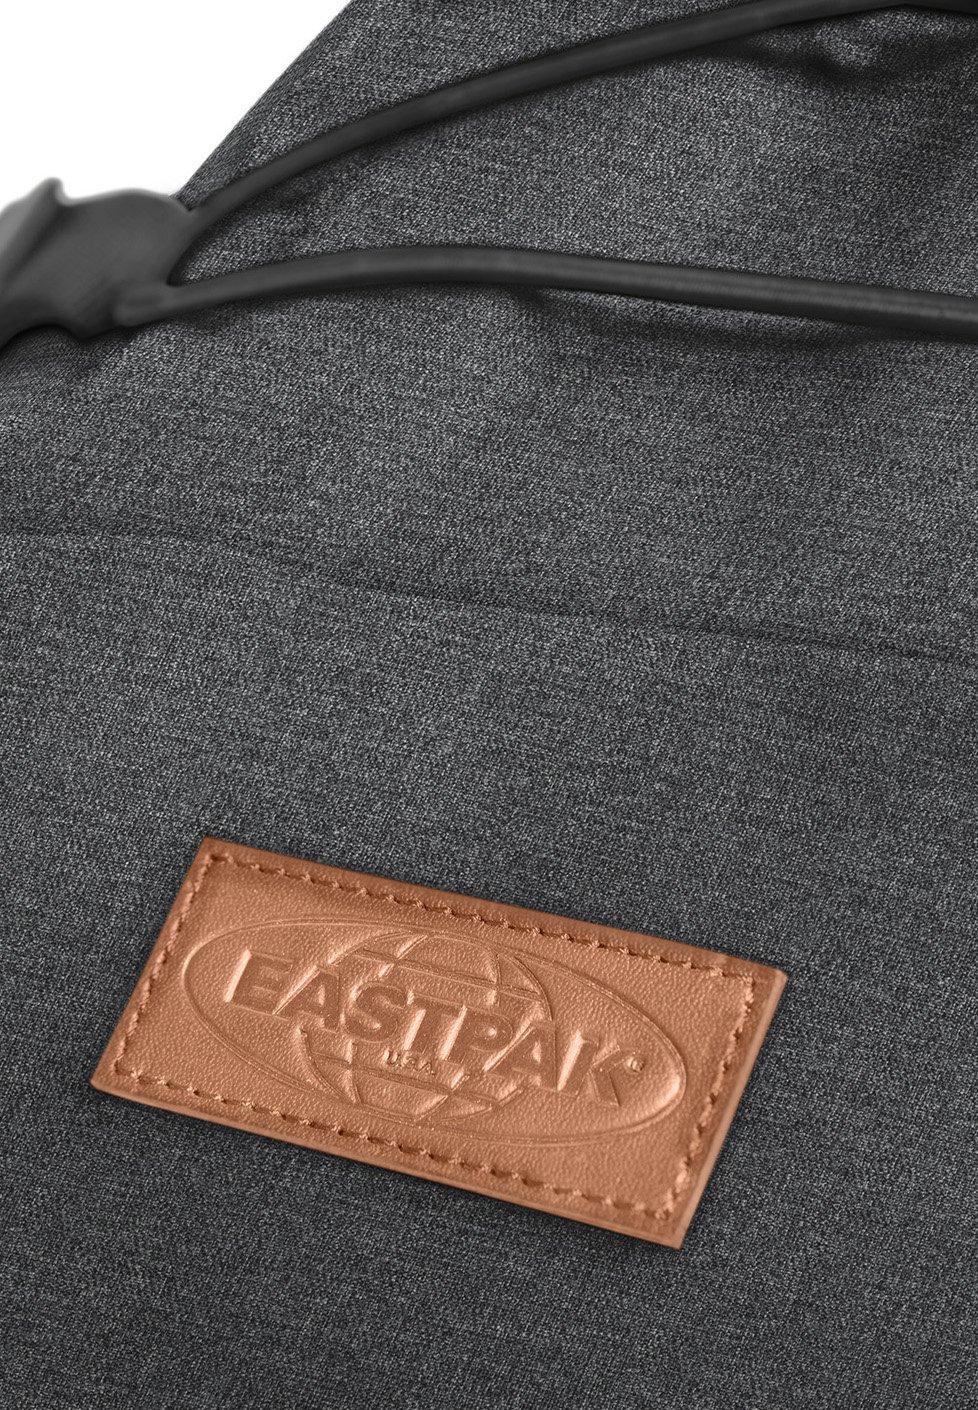 Eastpak BORYS - Tagesrucksack - black denim - Herrentaschen 1MsgP